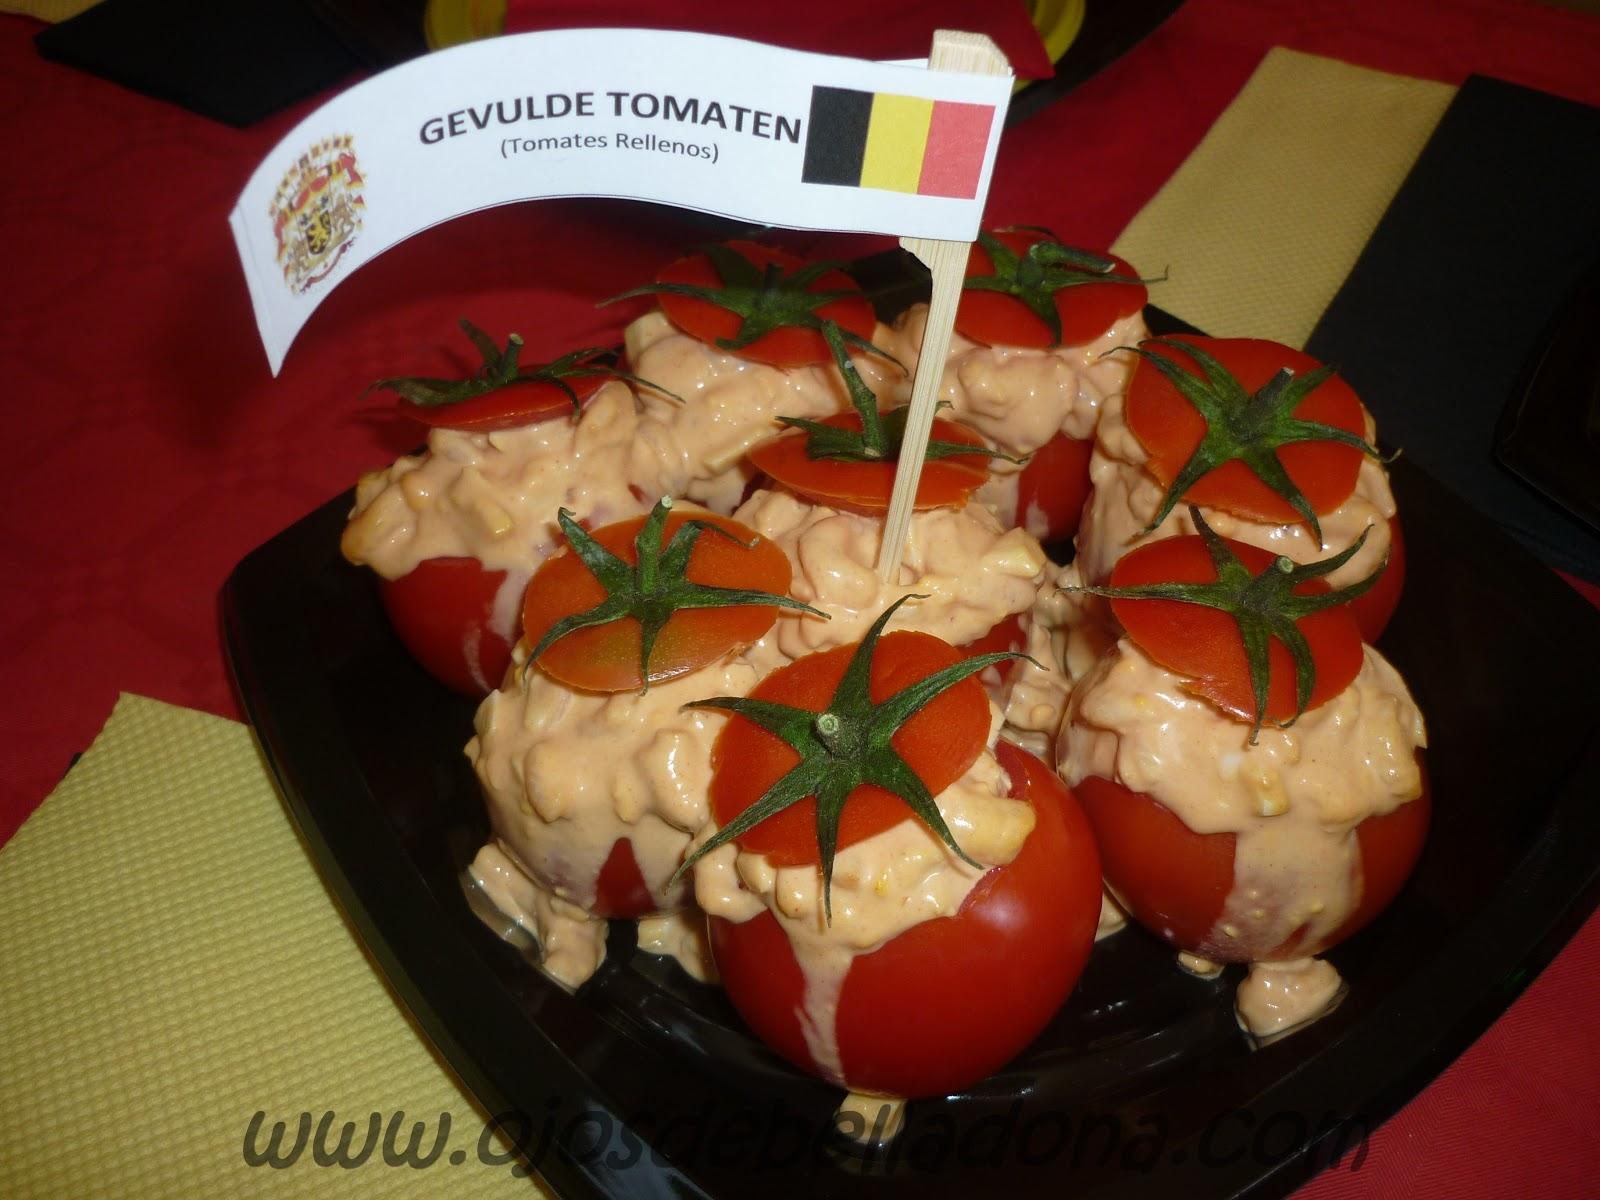 Gevulde tomaten (tomates rellenos), Bélgica